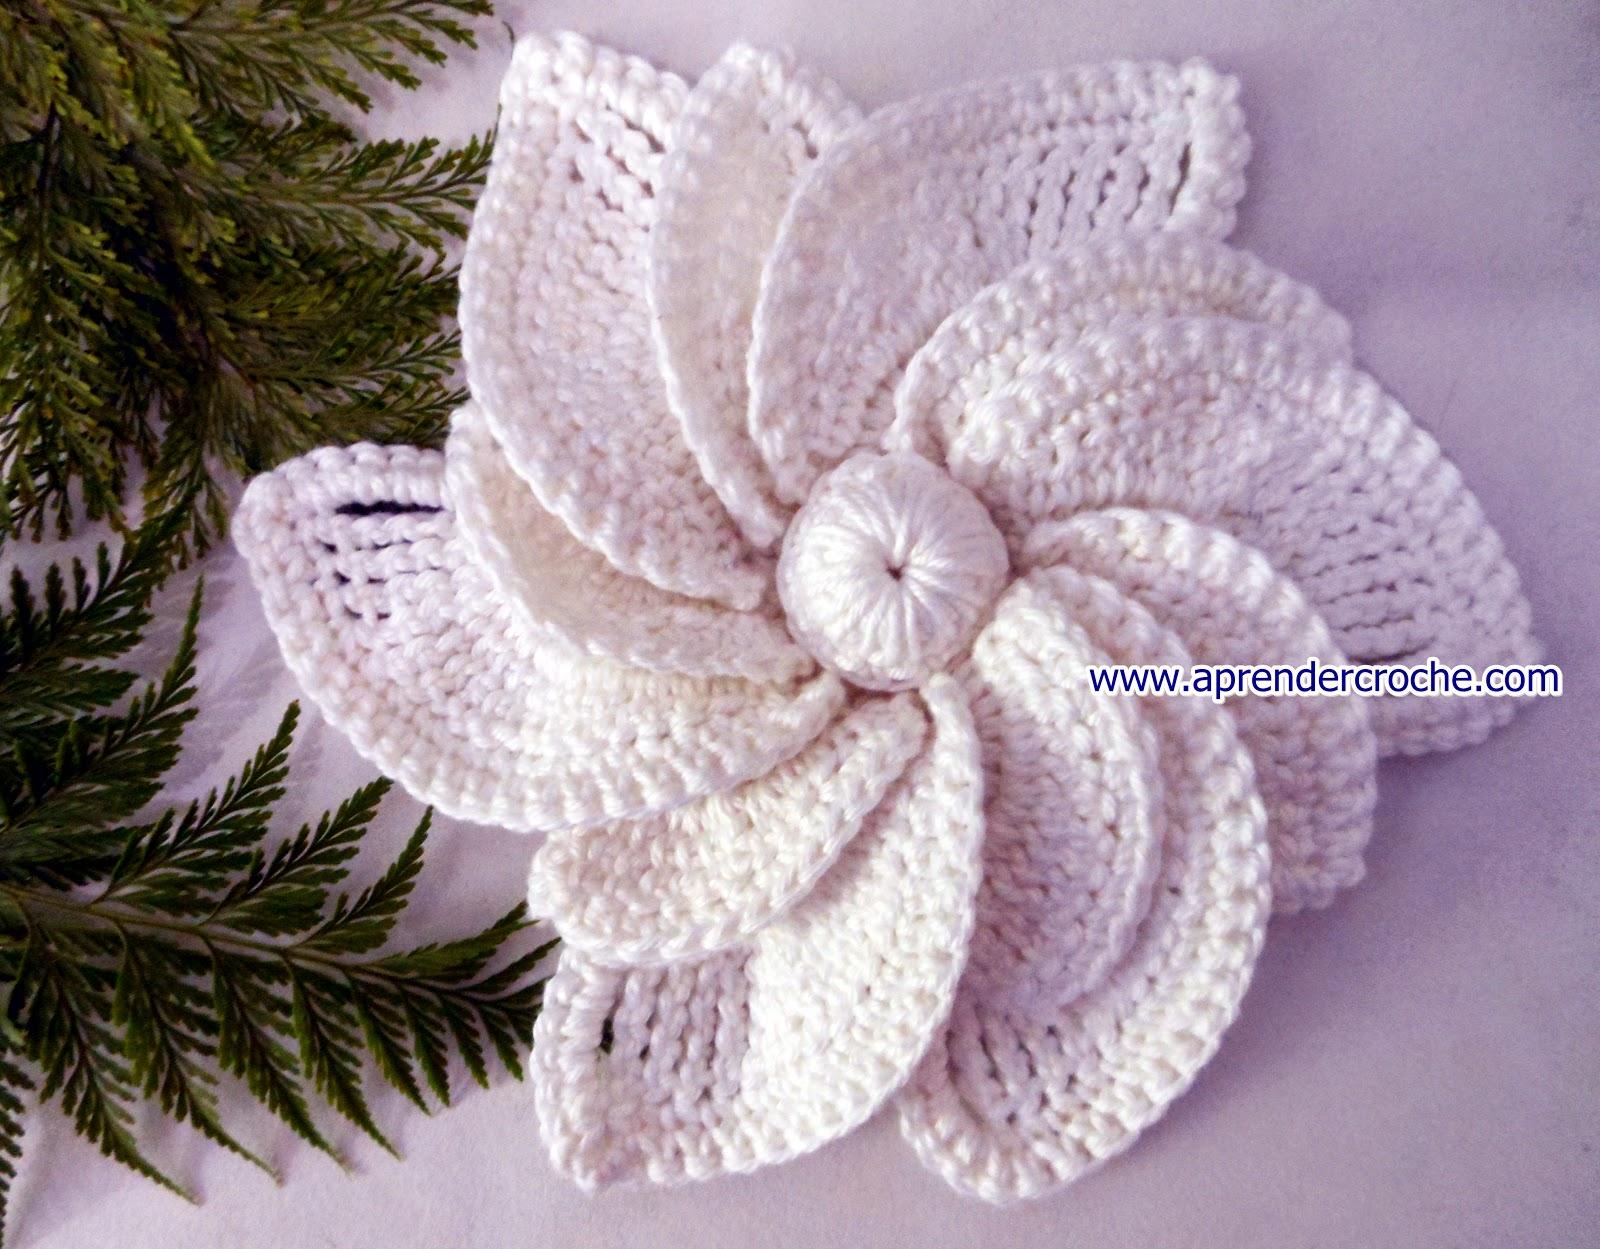 edinir croche ensina Flores em Croche Shalom com edinir croche no curso de croche no blog aprender croche